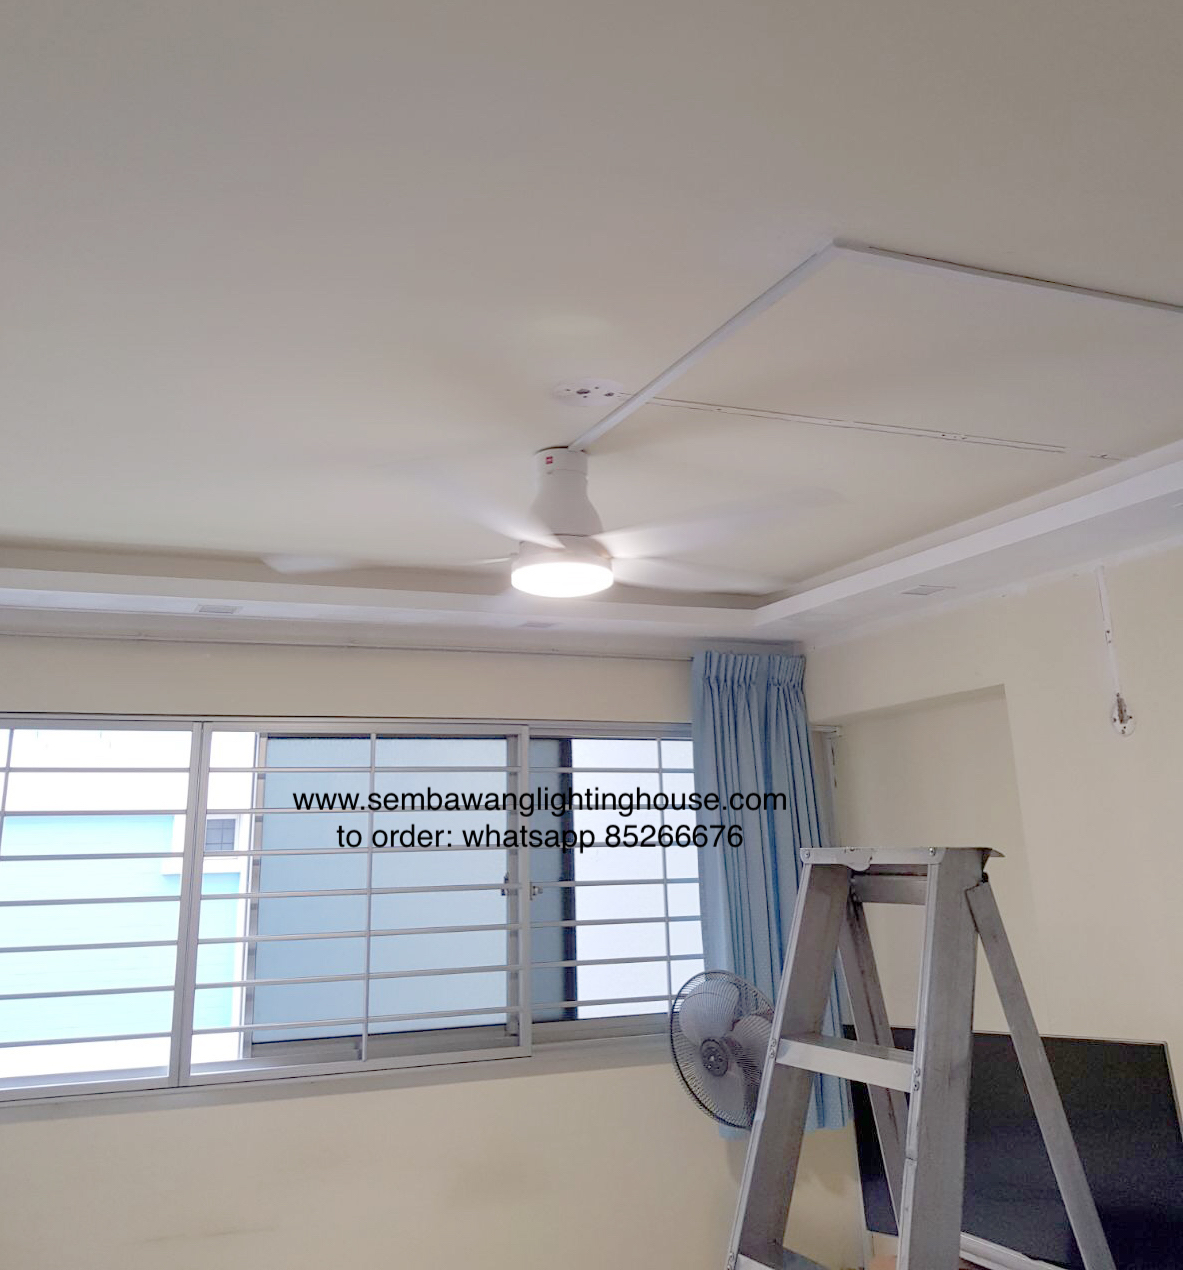 kdk-u60fw-white-ceiling-fan-sembawang-lighting-house-sample-05.jpg